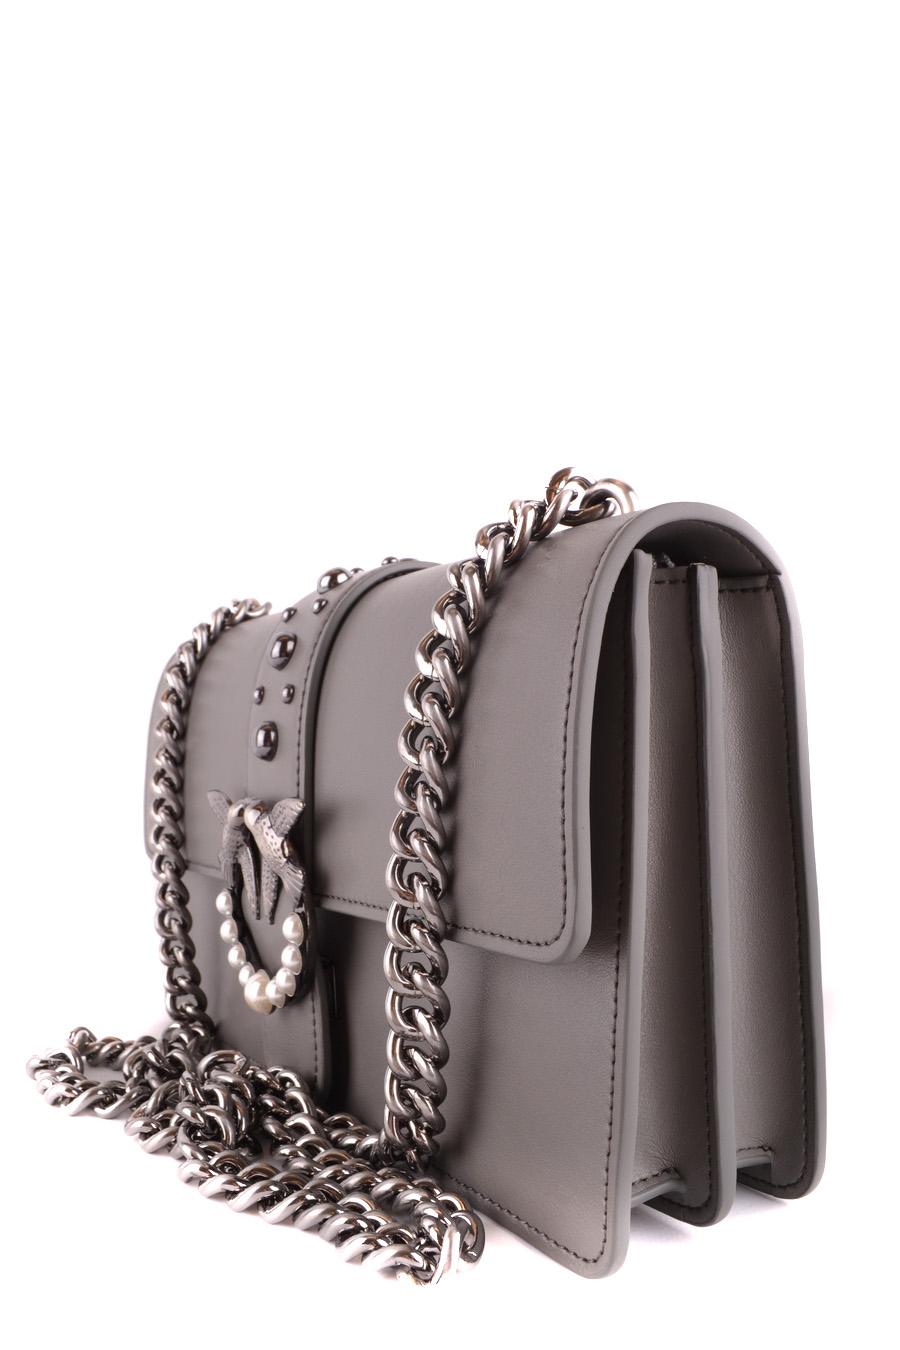 huge selection of d228d 5fb9b PINKO Bags | ViganoBoutique.com